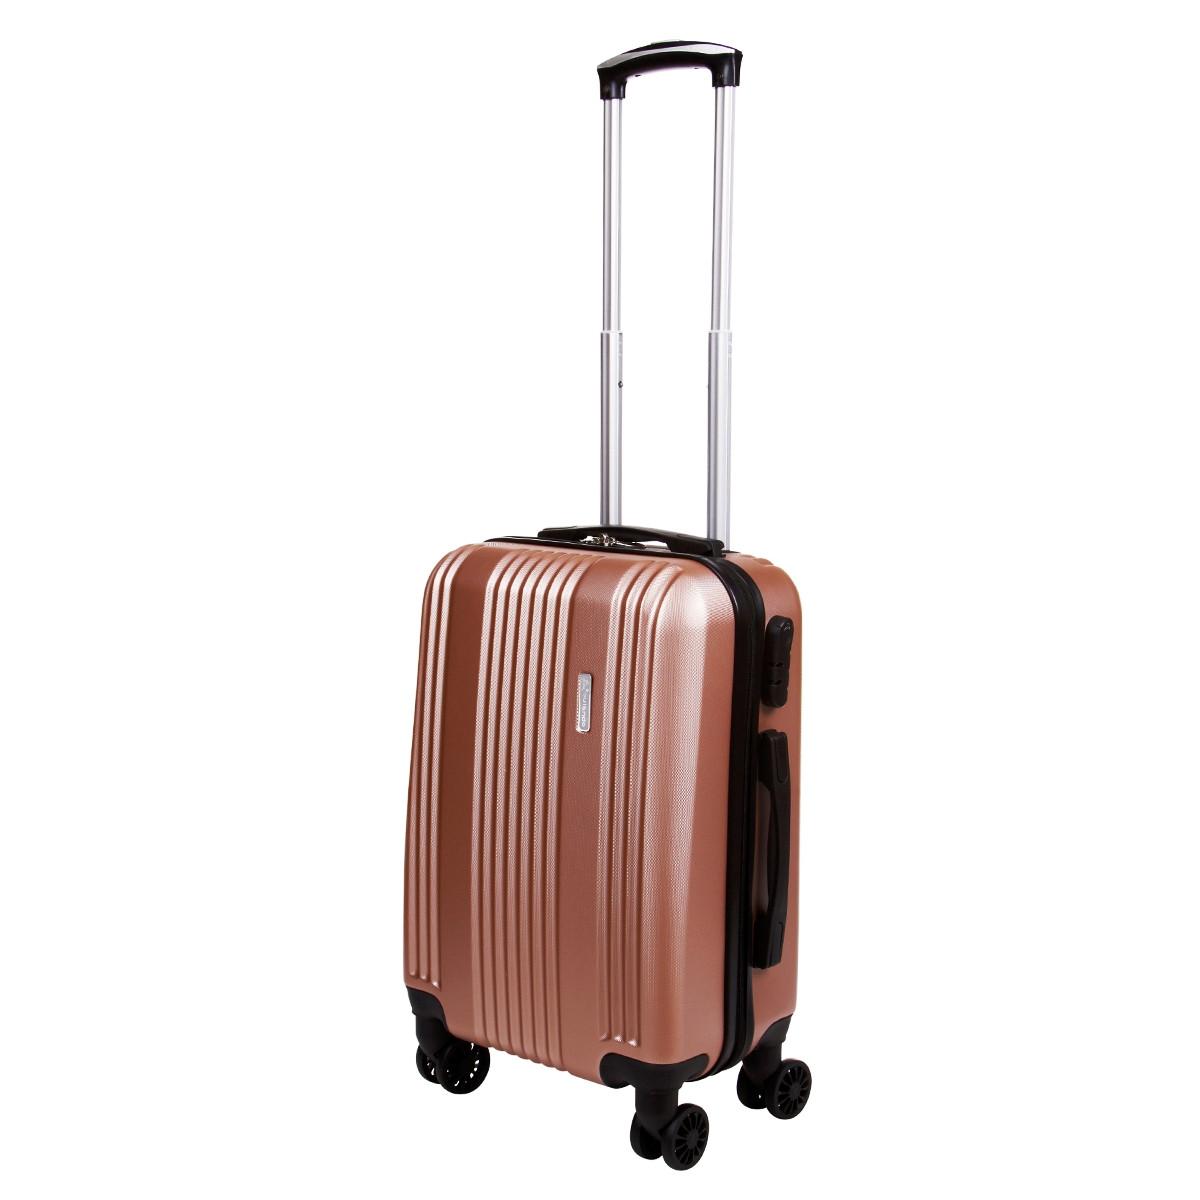 Чемодан маленький OULANDO 4 колеса пластик ABS 36х48х22 розовый ксЛ516-20роз